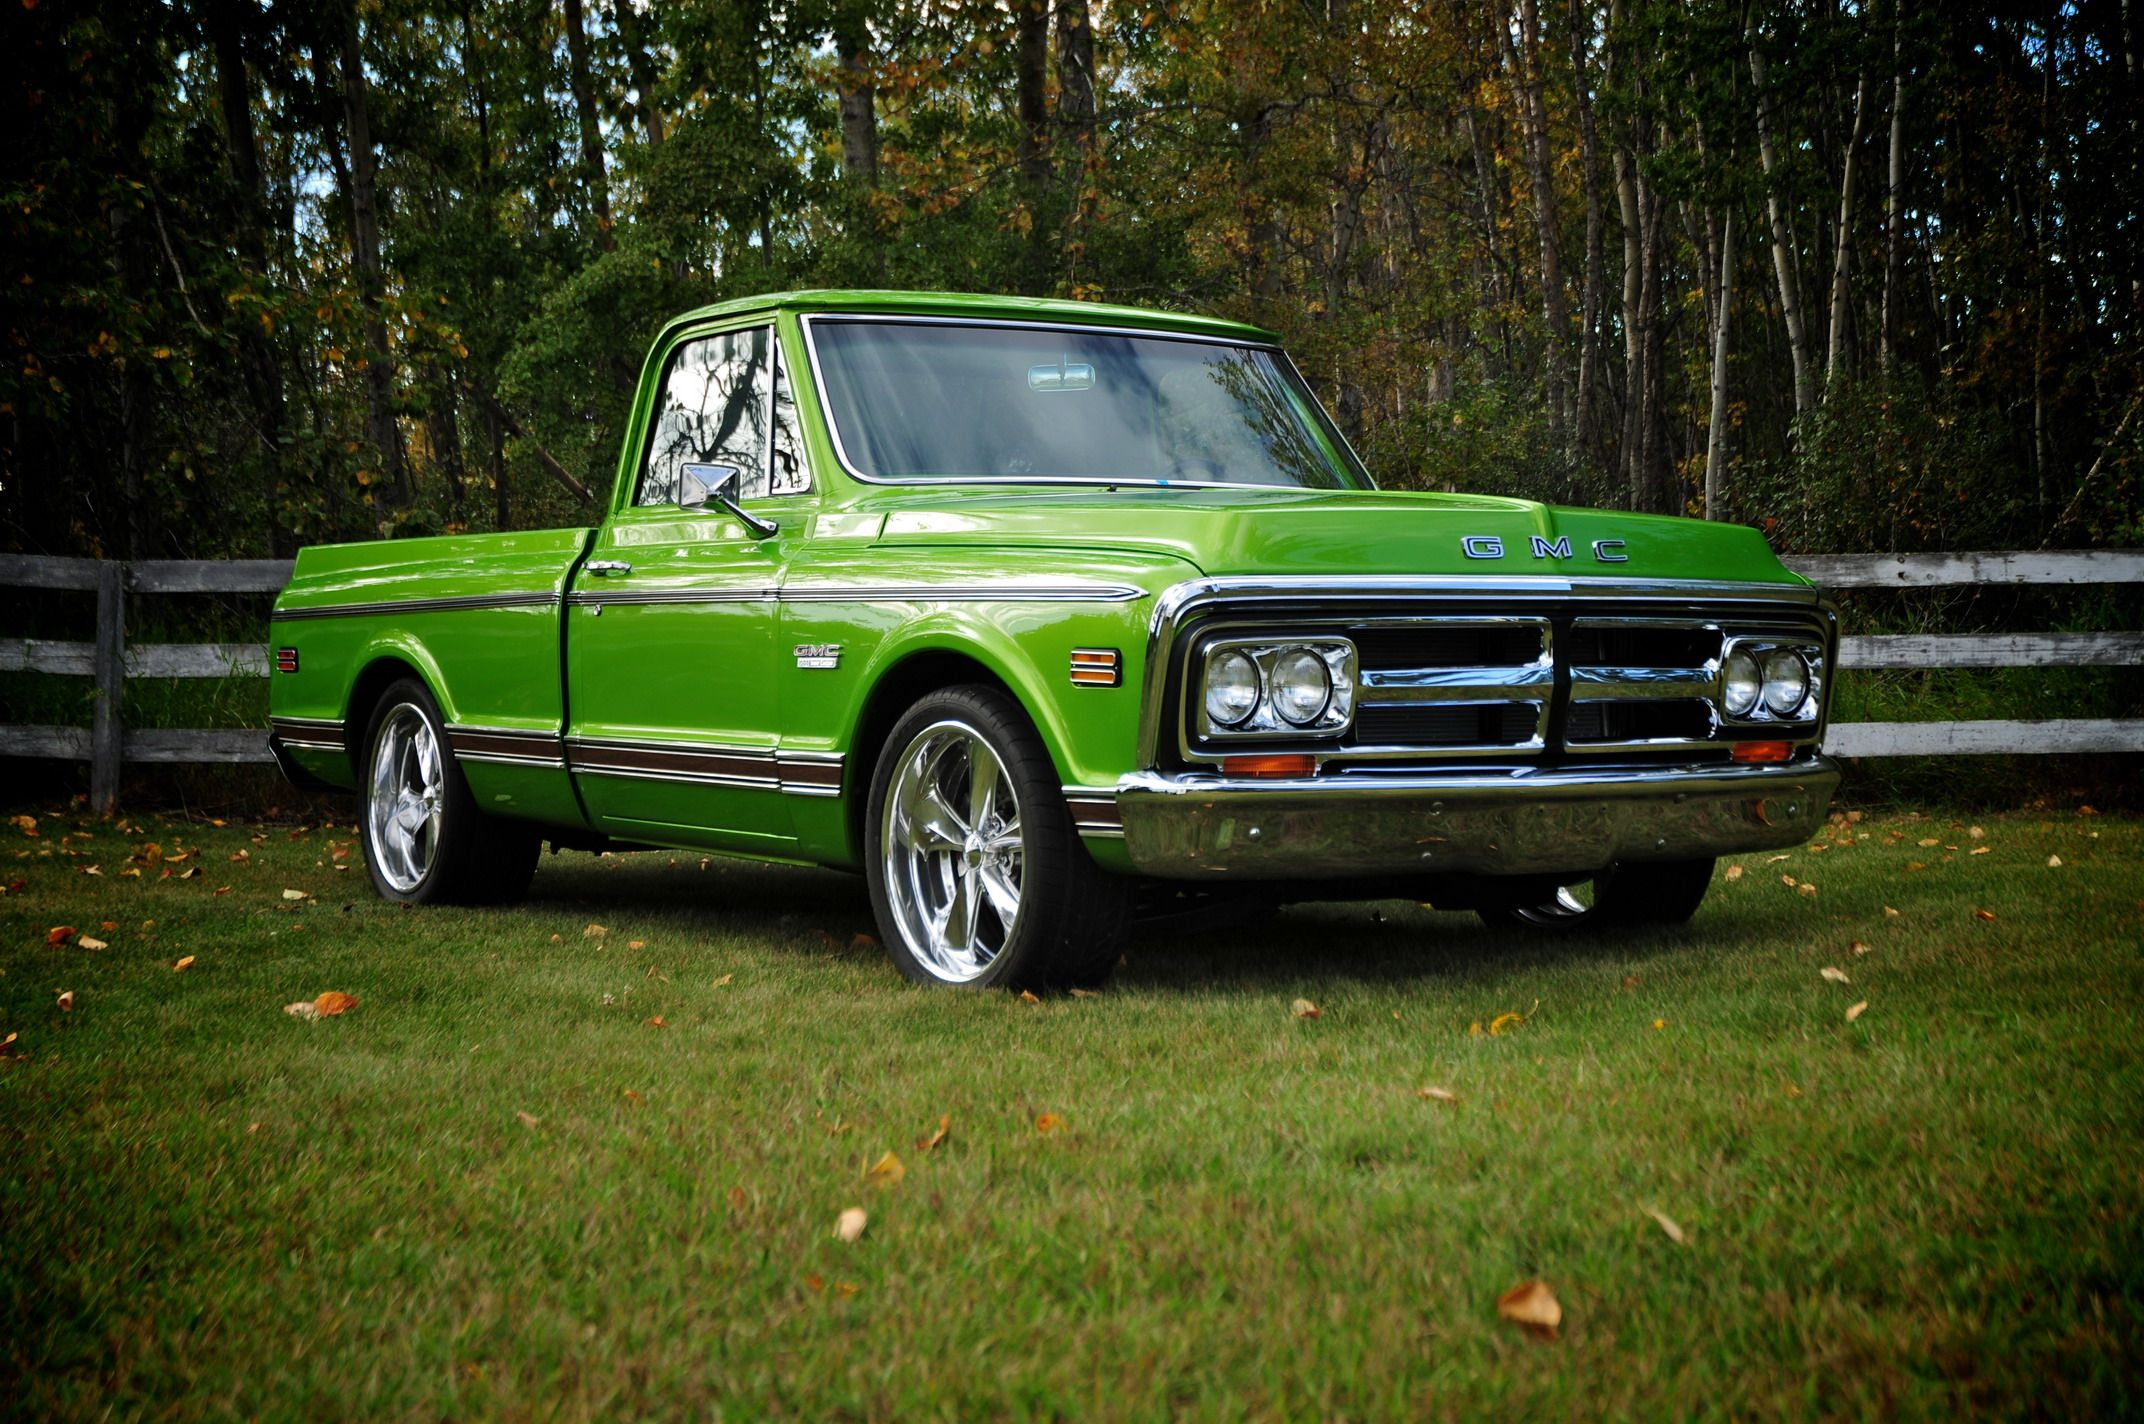 1970 Gmc Truck That I Like Cars And Trucks Pinterest